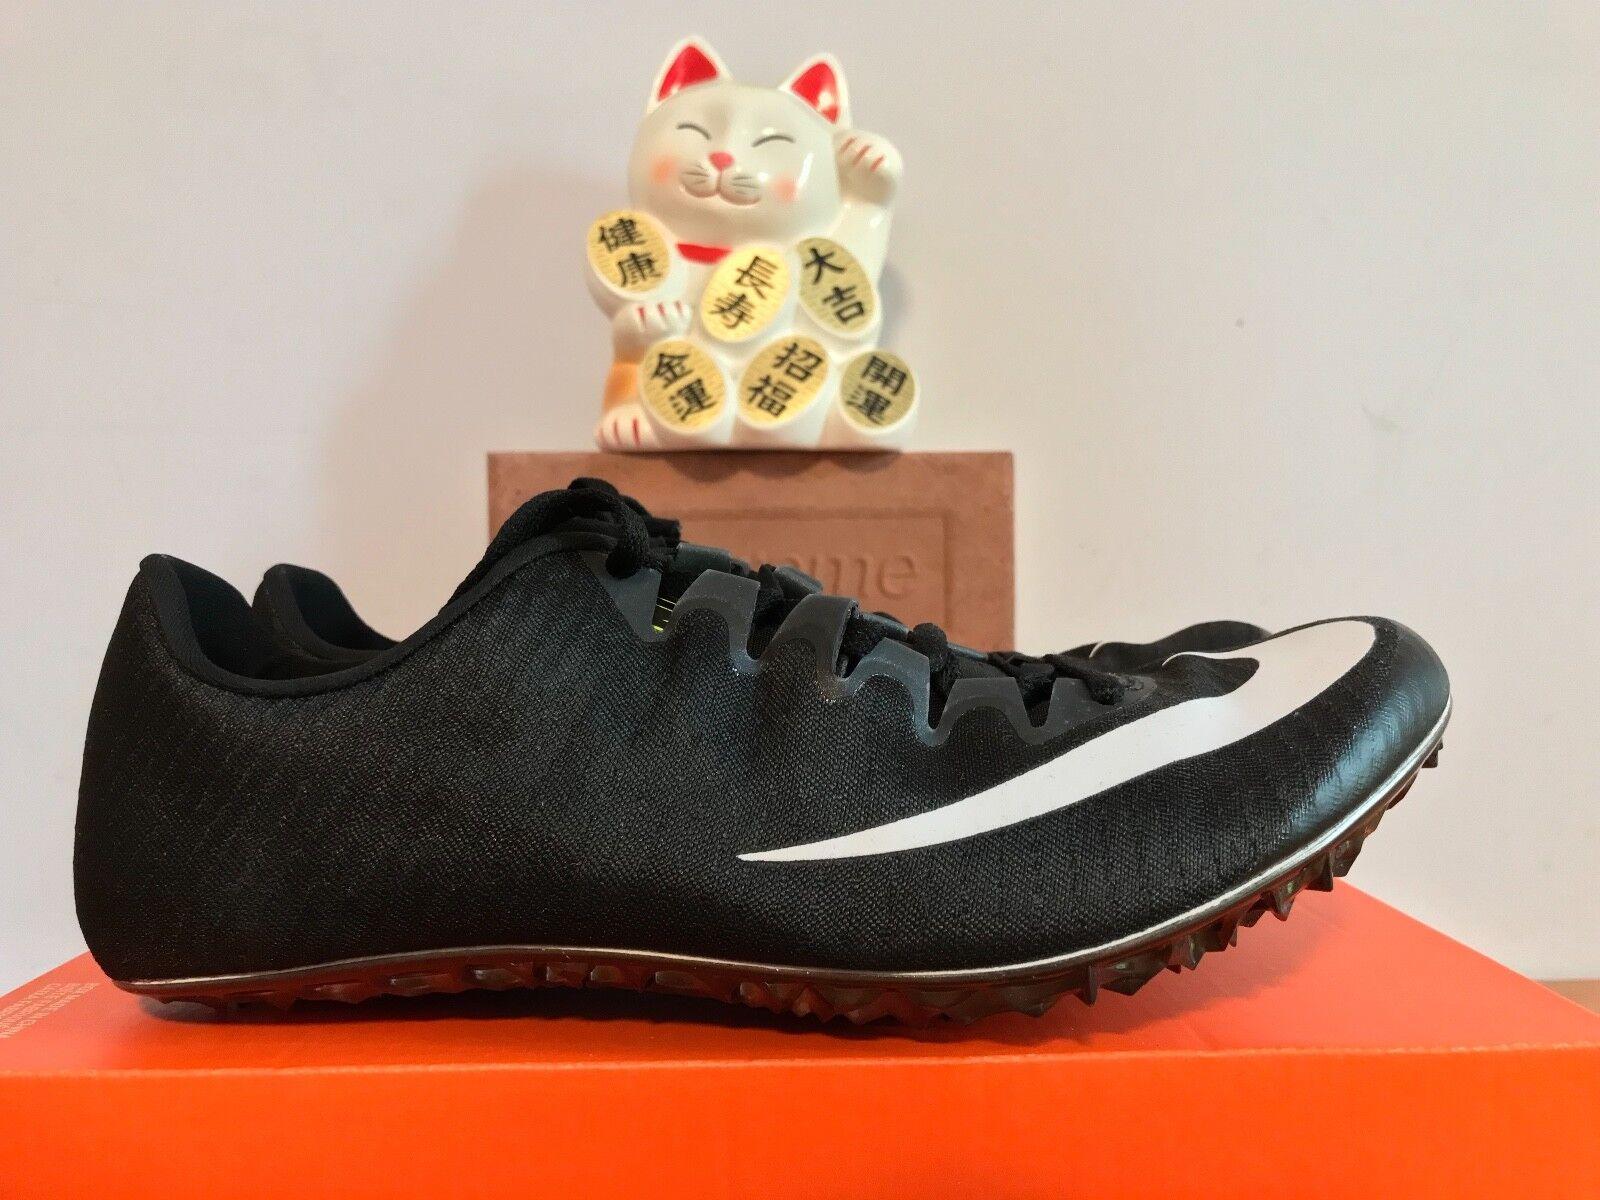 Nike Zoom Superfly Elite bianca In Spike esecuzione Track Spike In Nero bianca Elite   28edad